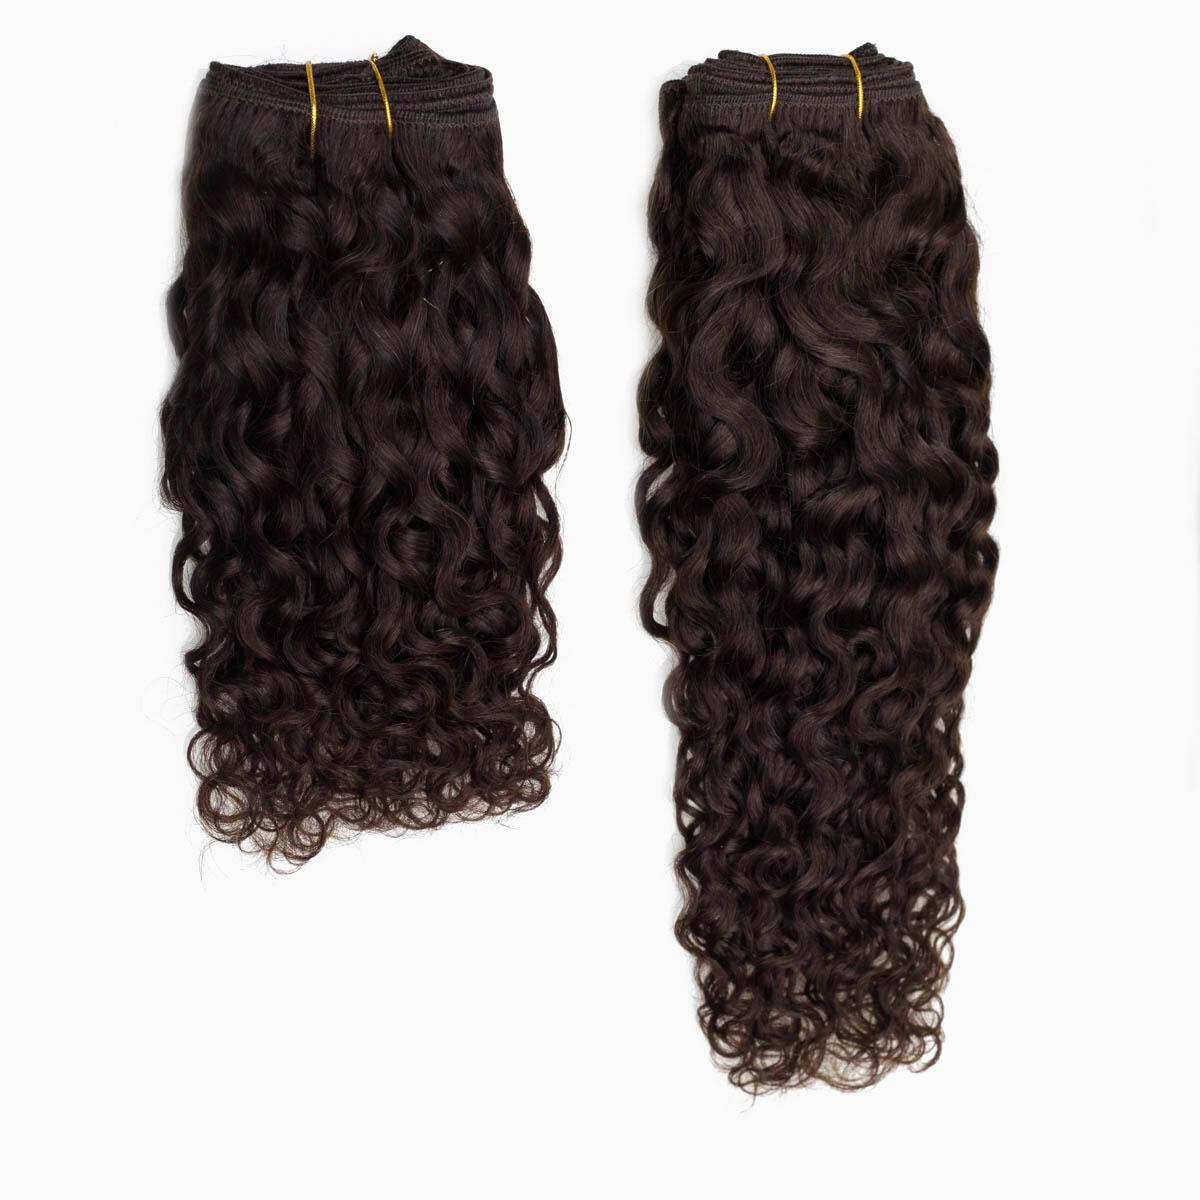 Hair Weft 2.3 Chocolate Brown 40 cm